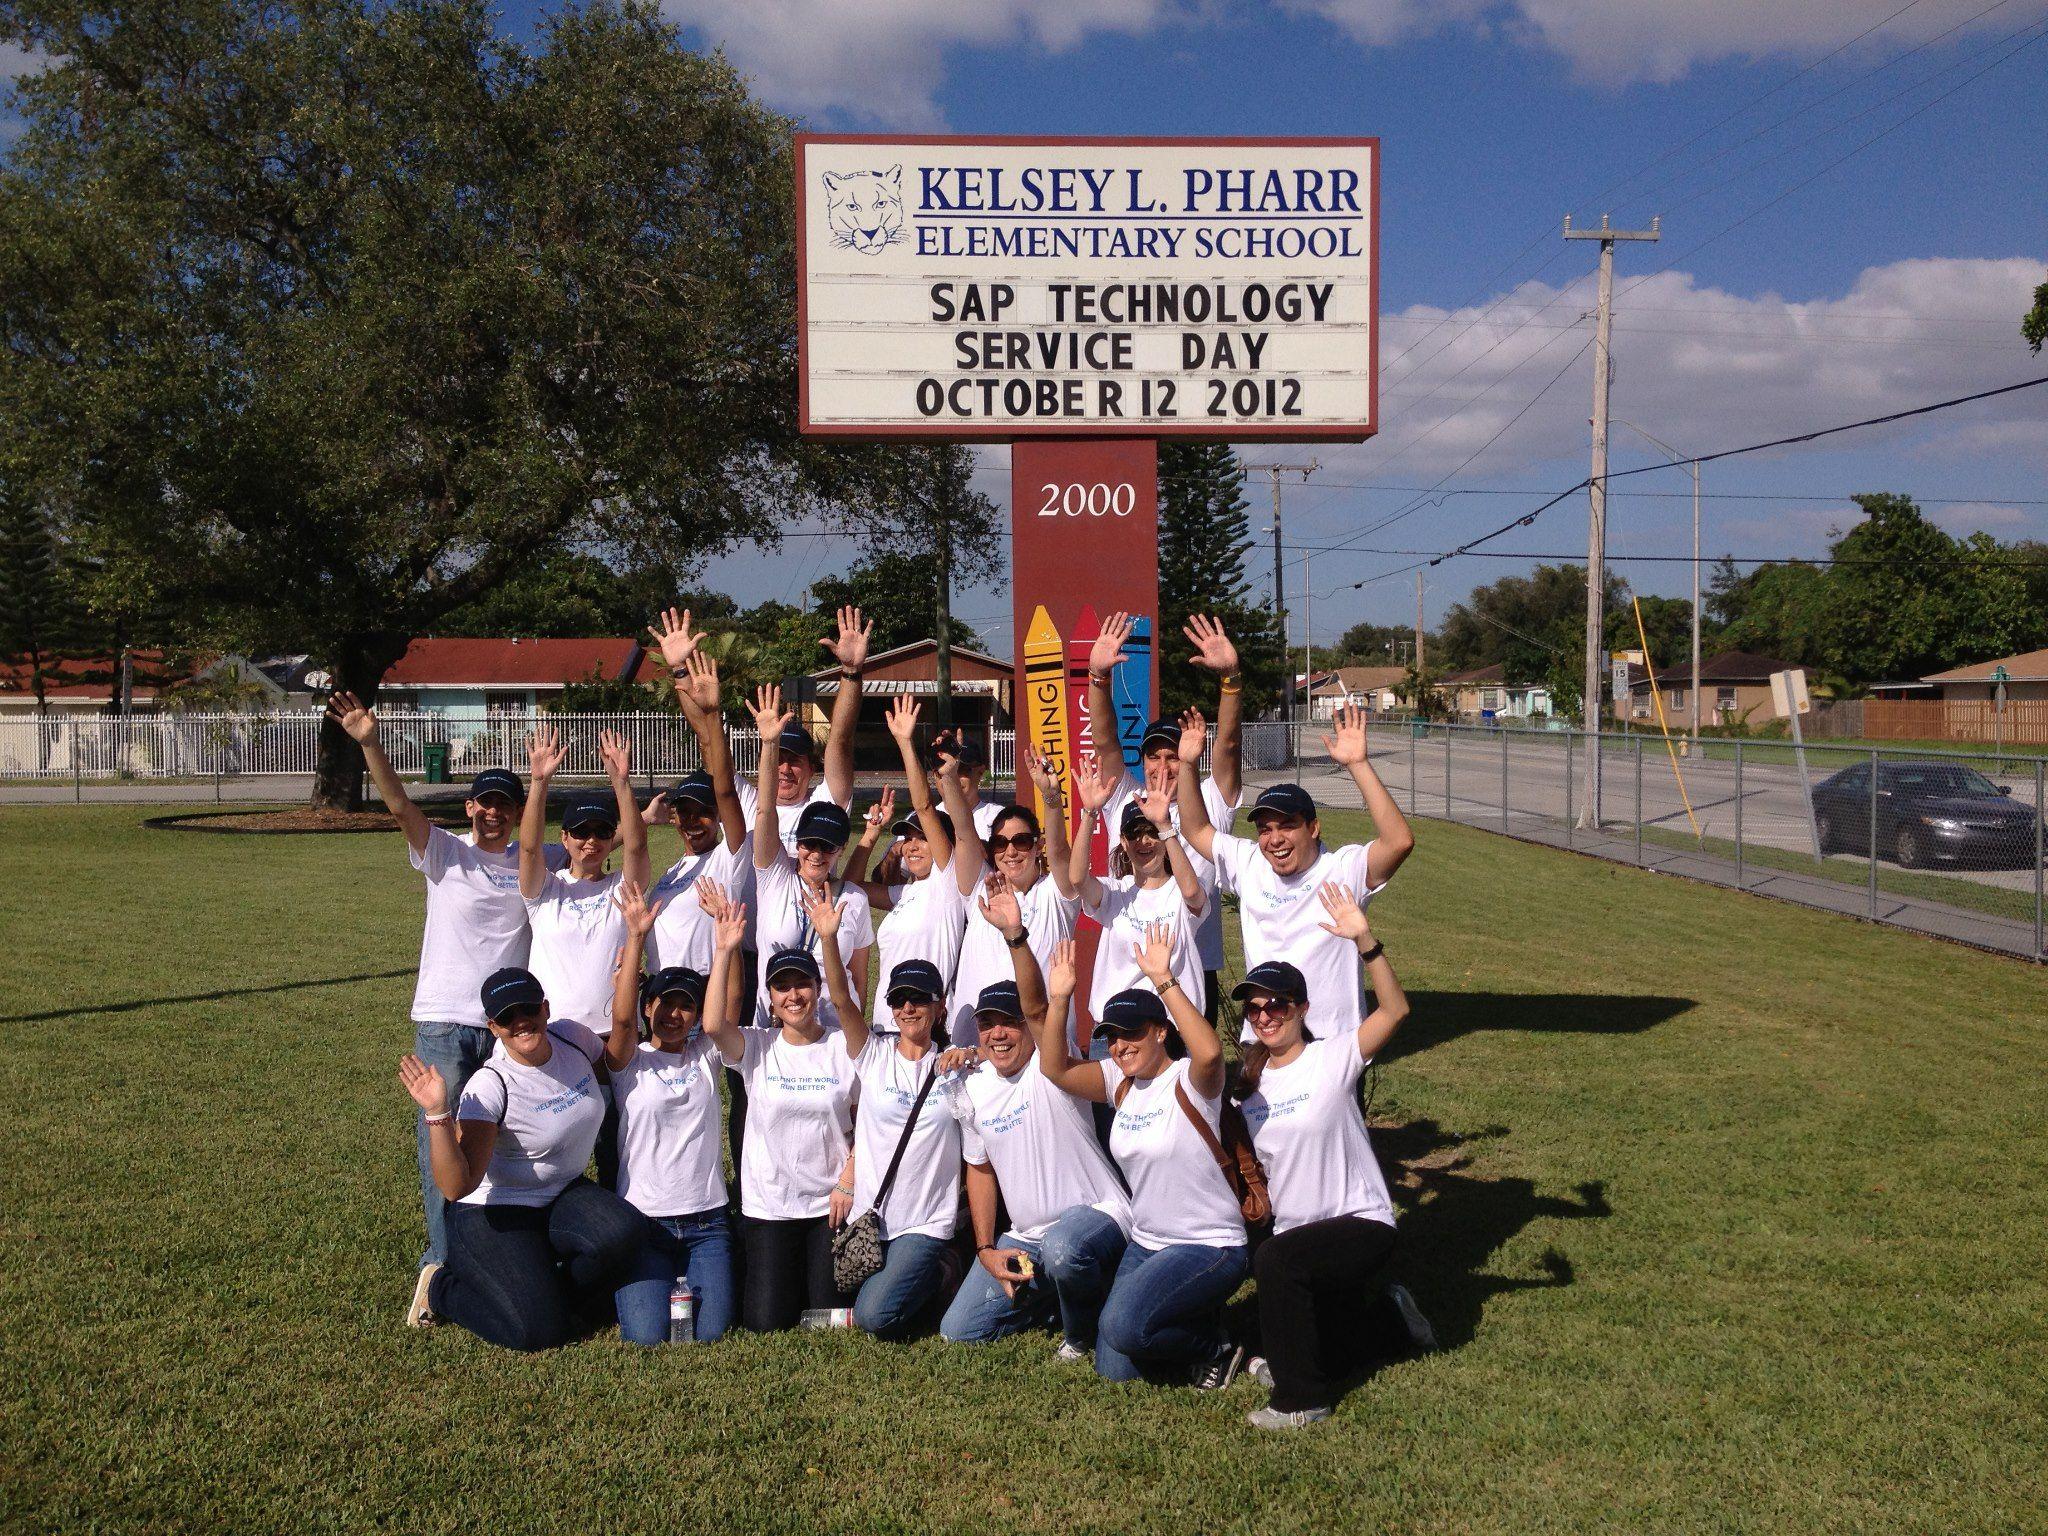 Sap Enhances Kelsey L Pharr Elementary School Elementary Schools Elementary School Learn more about how to get involved. sap enhances kelsey l pharr elementary